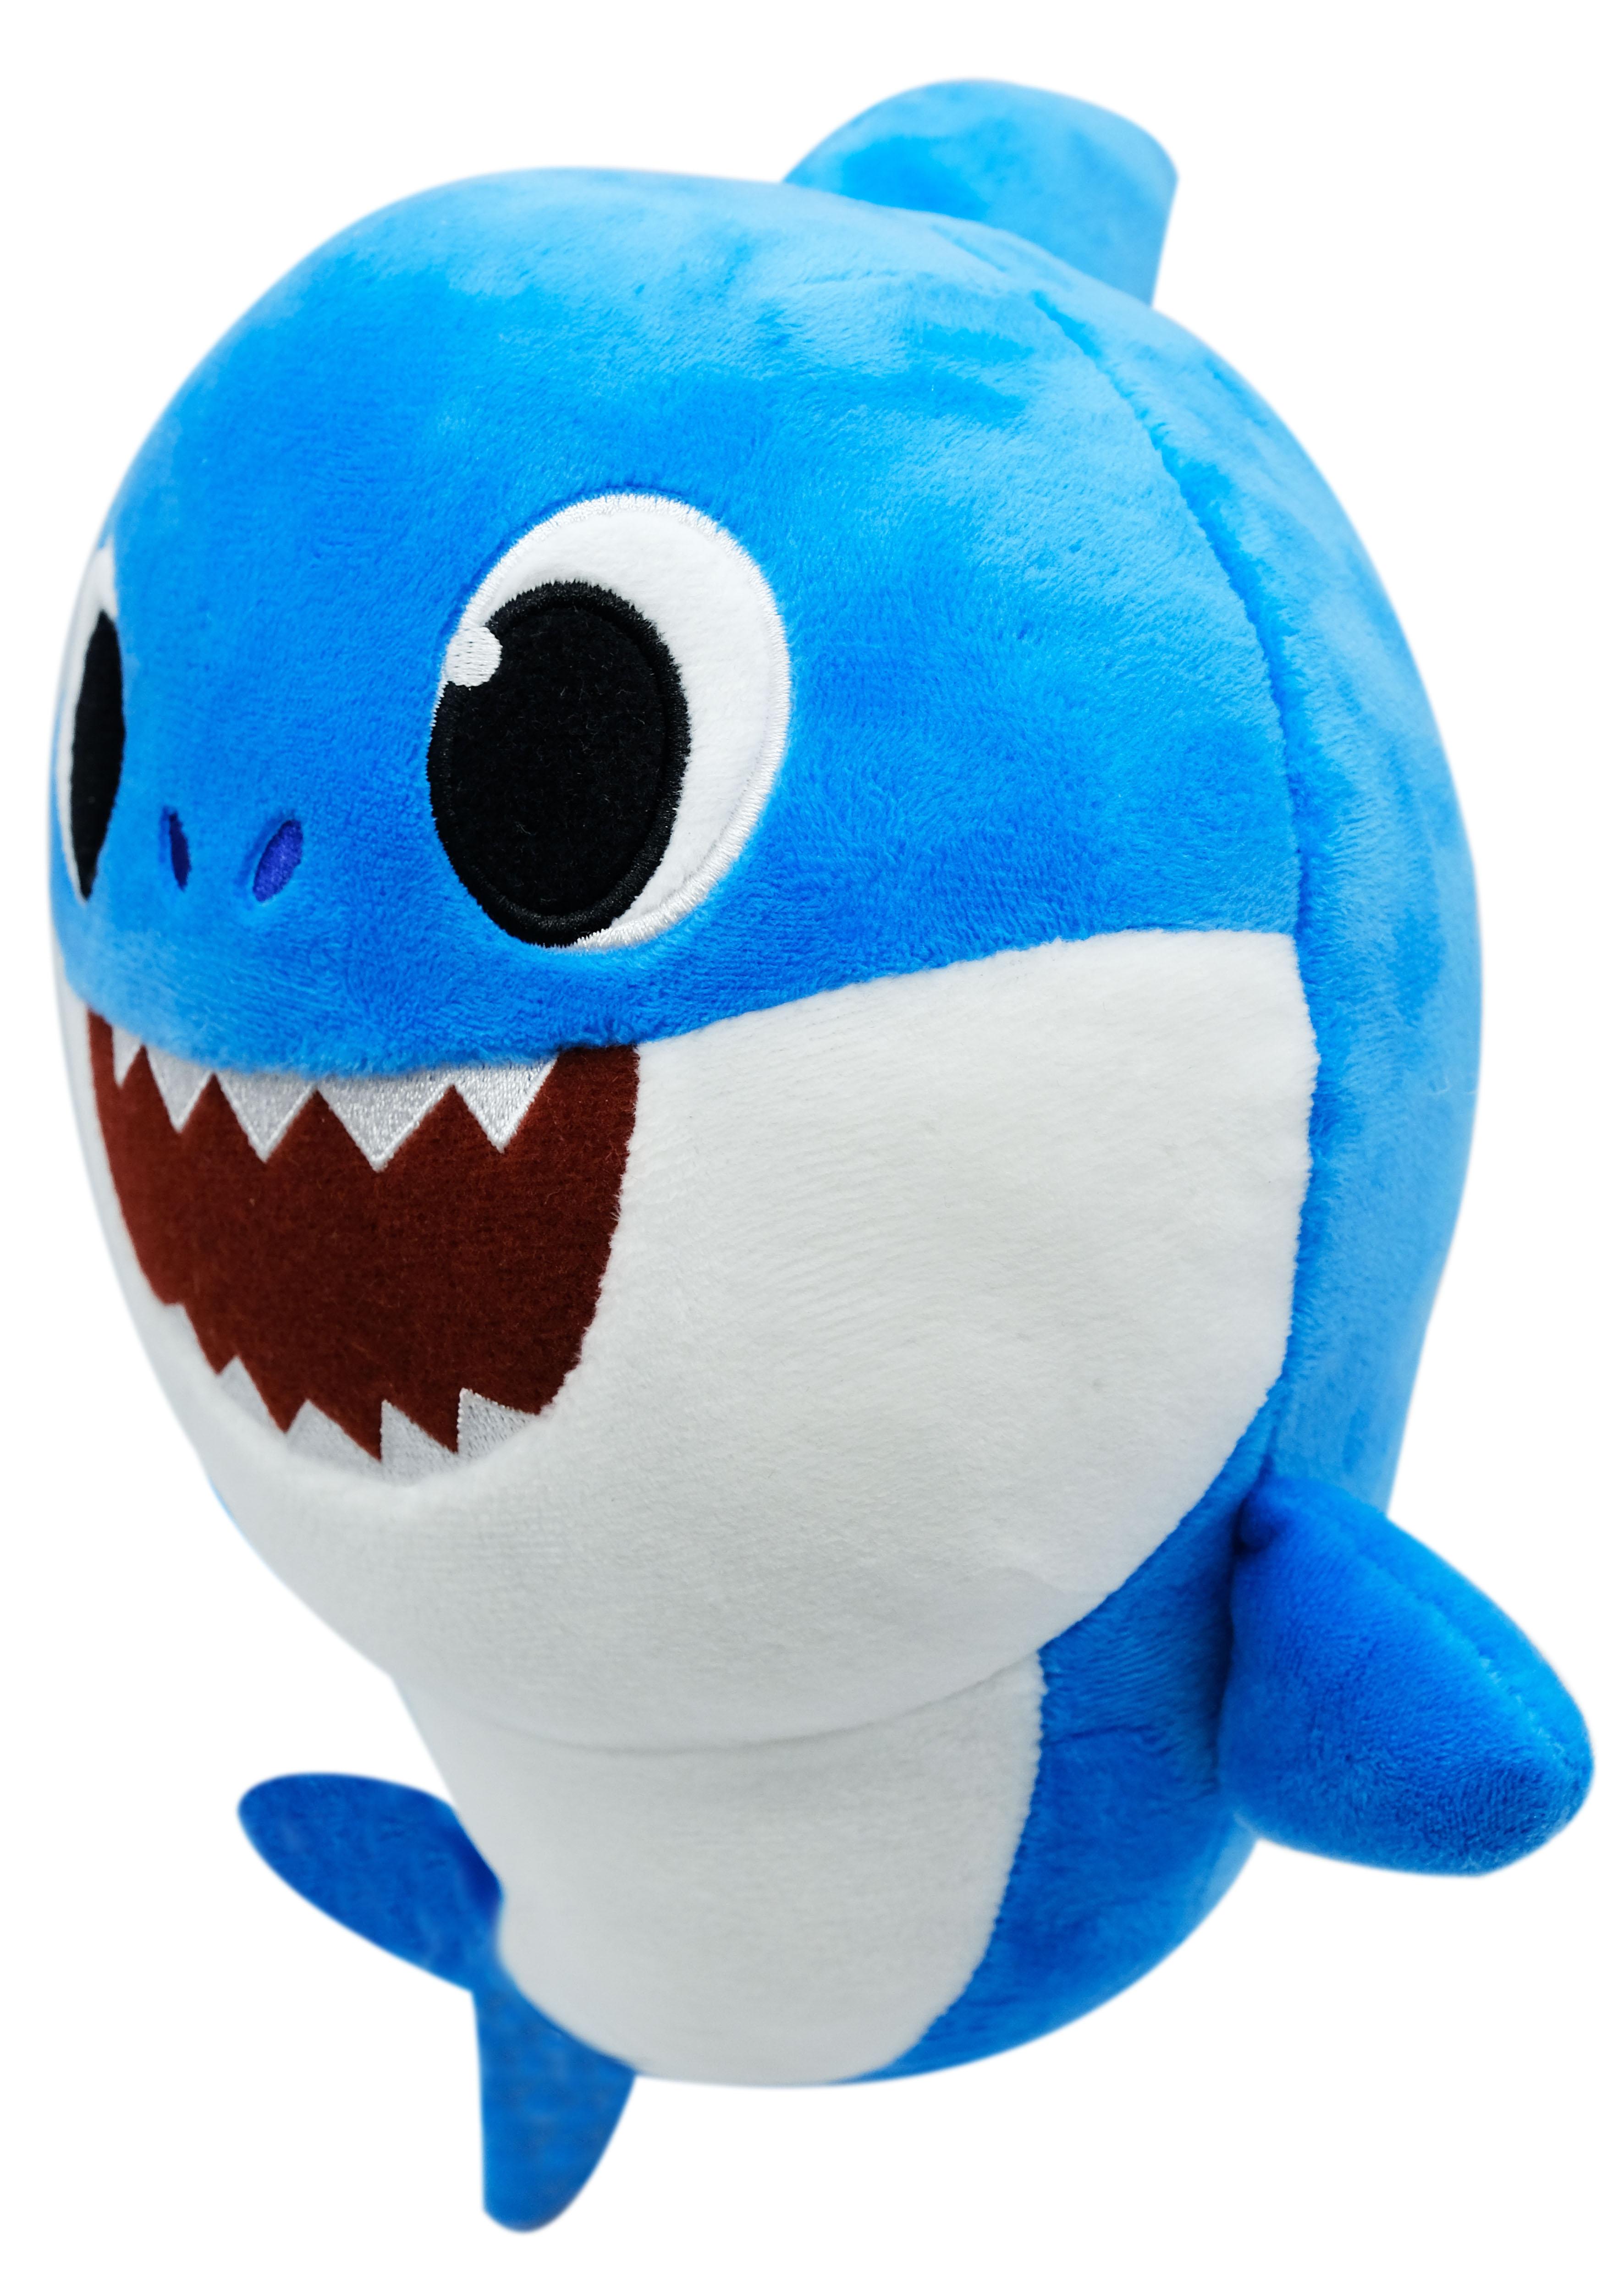 SS120151240000 Baby Shark Sound Doll - Father Shark (2)